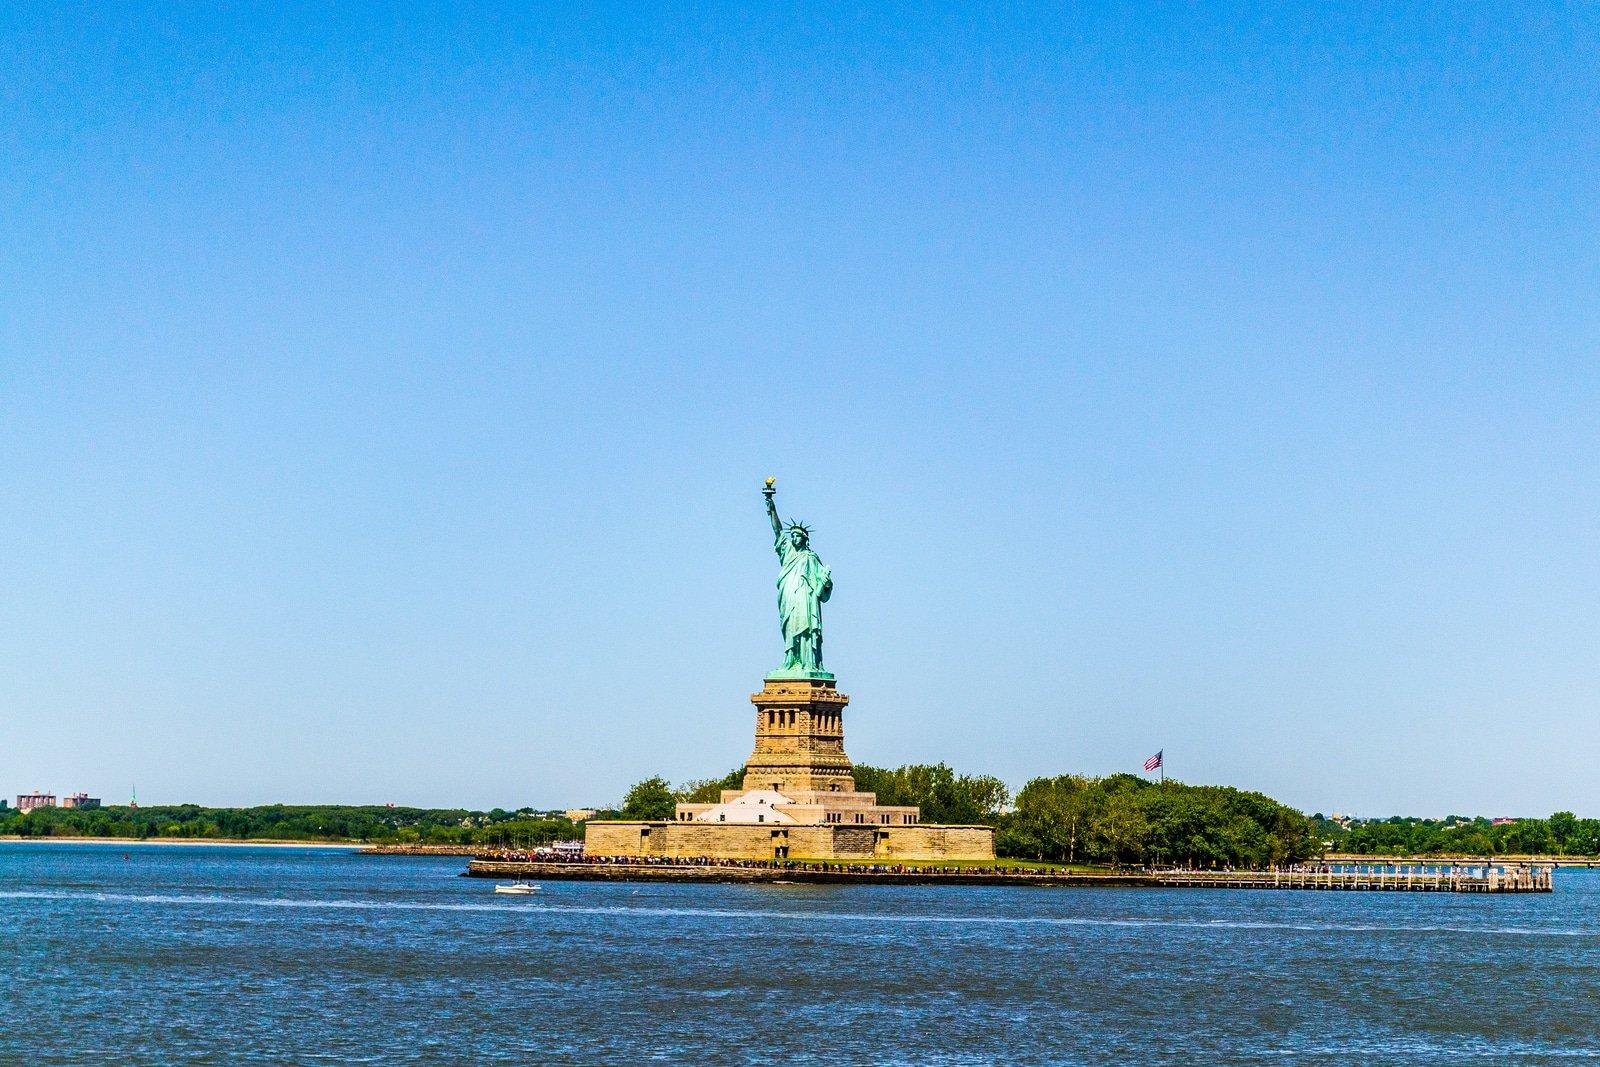 Egbertville Staten Island, NY Private Investigator